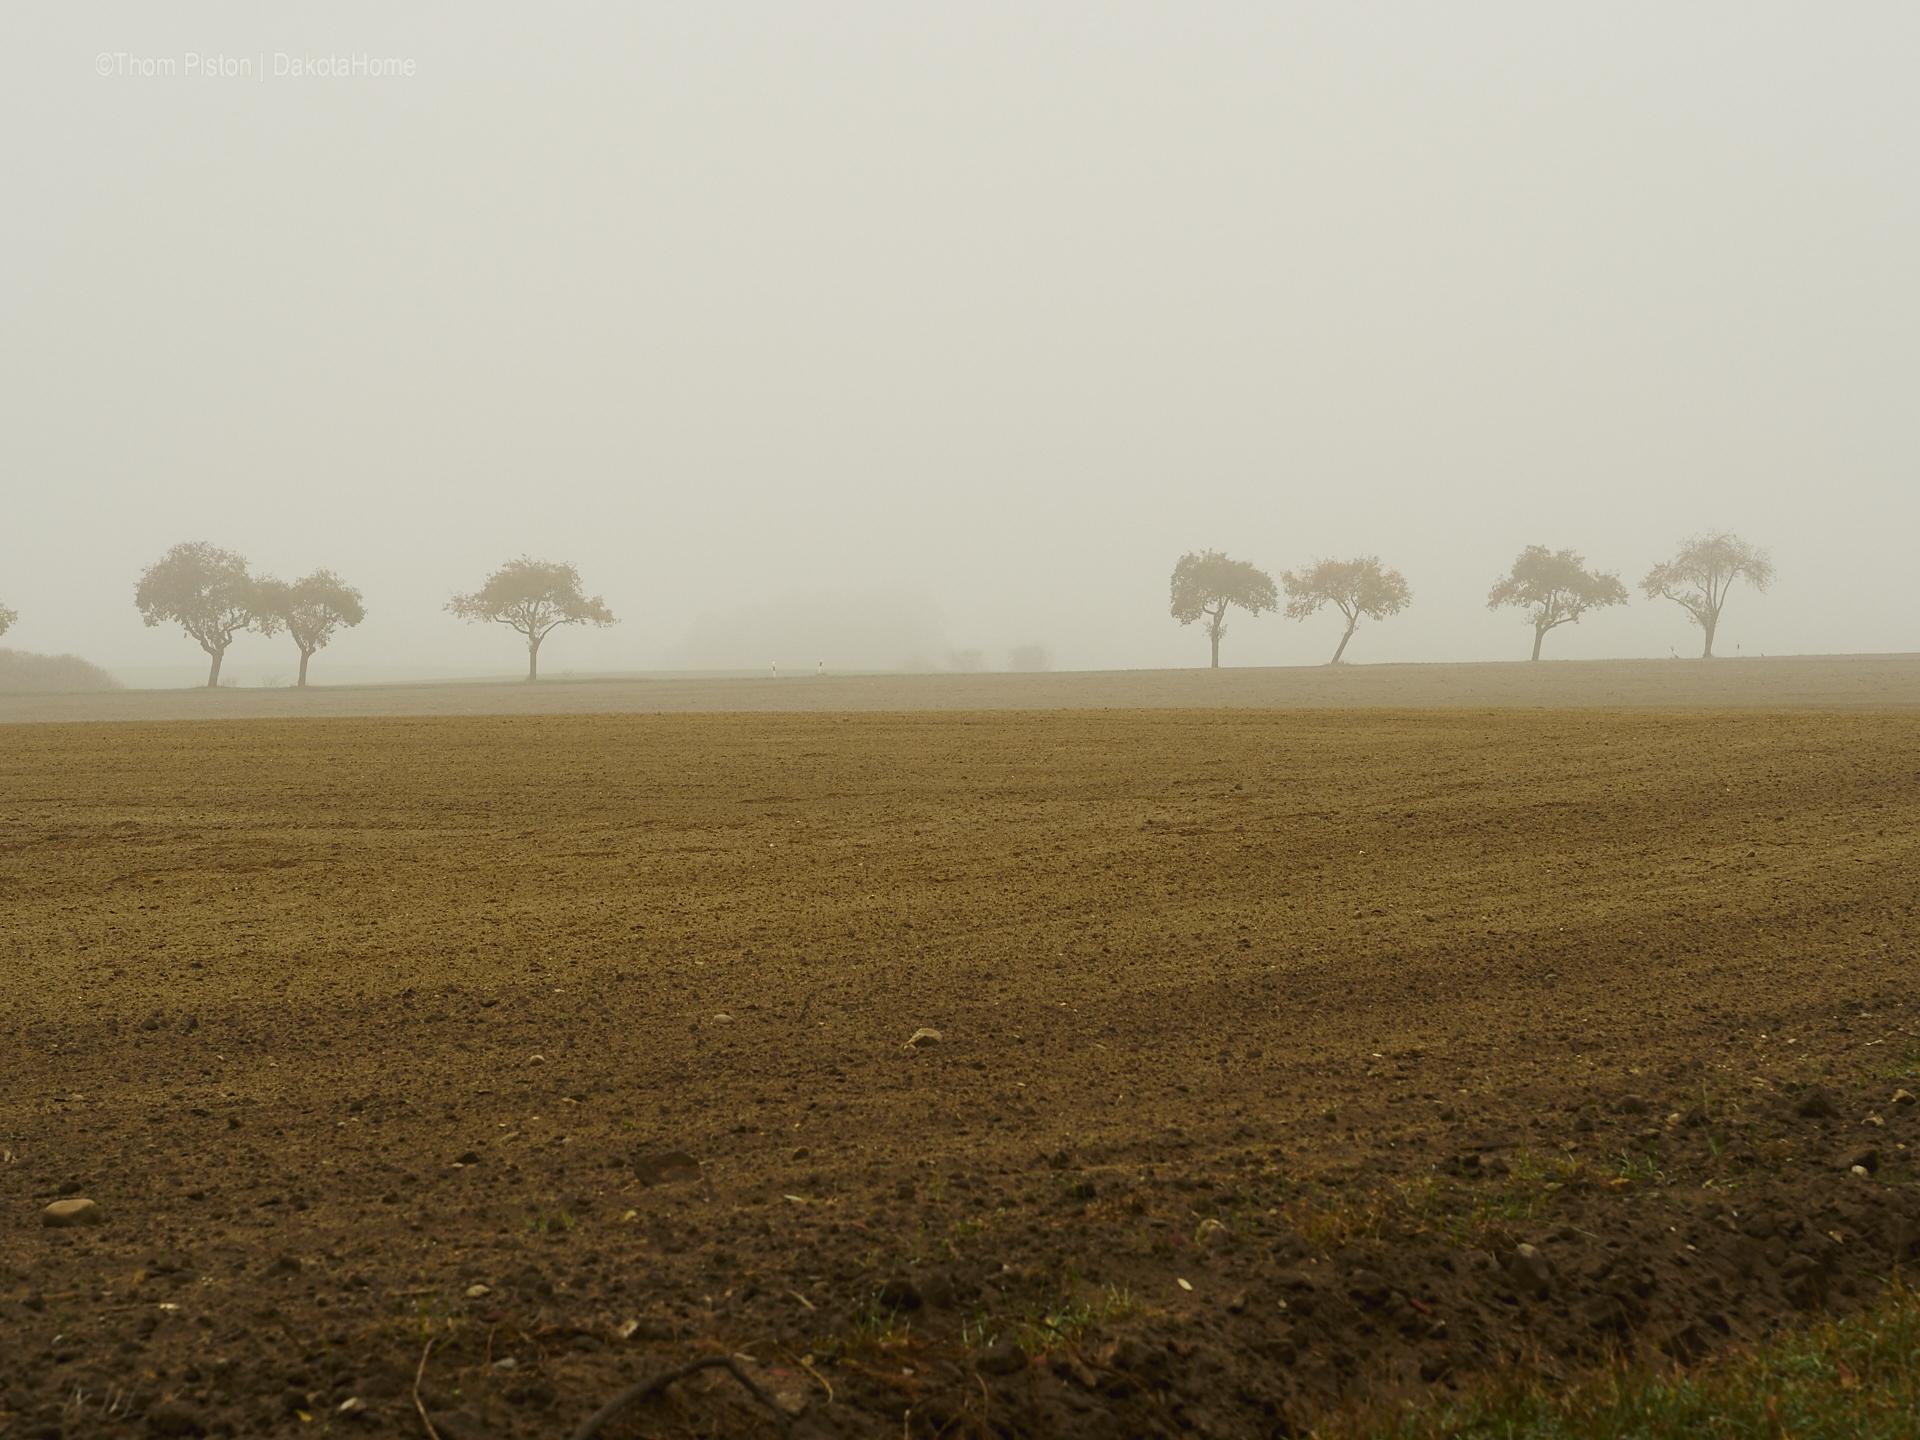 Mitte November, Nebel in Brandenburg